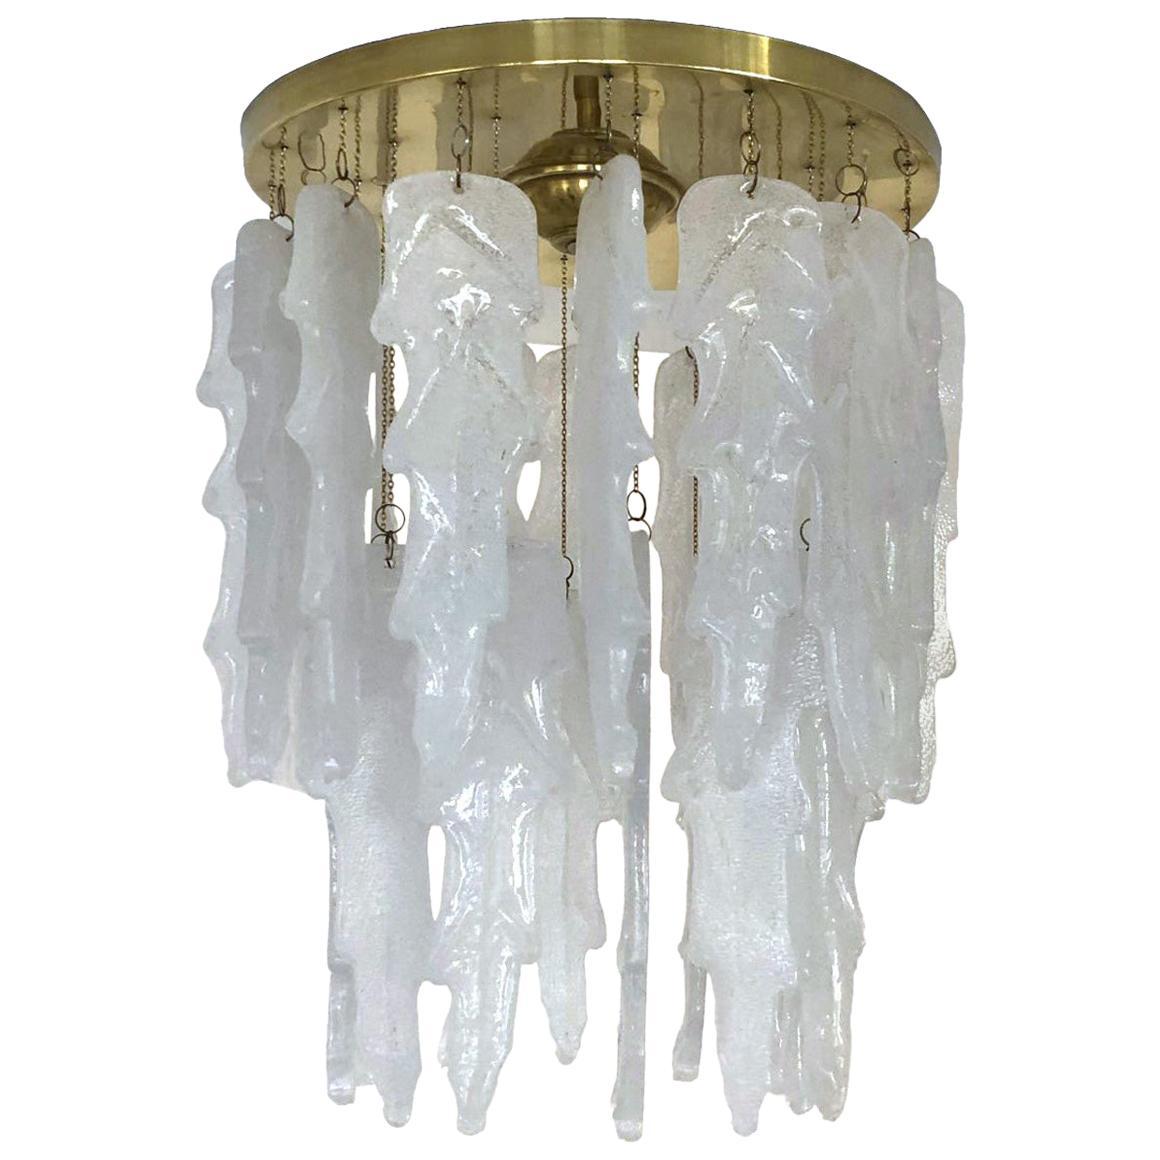 Italian Midcentury Murano Glass Chandelier by Mazzega, 1970s